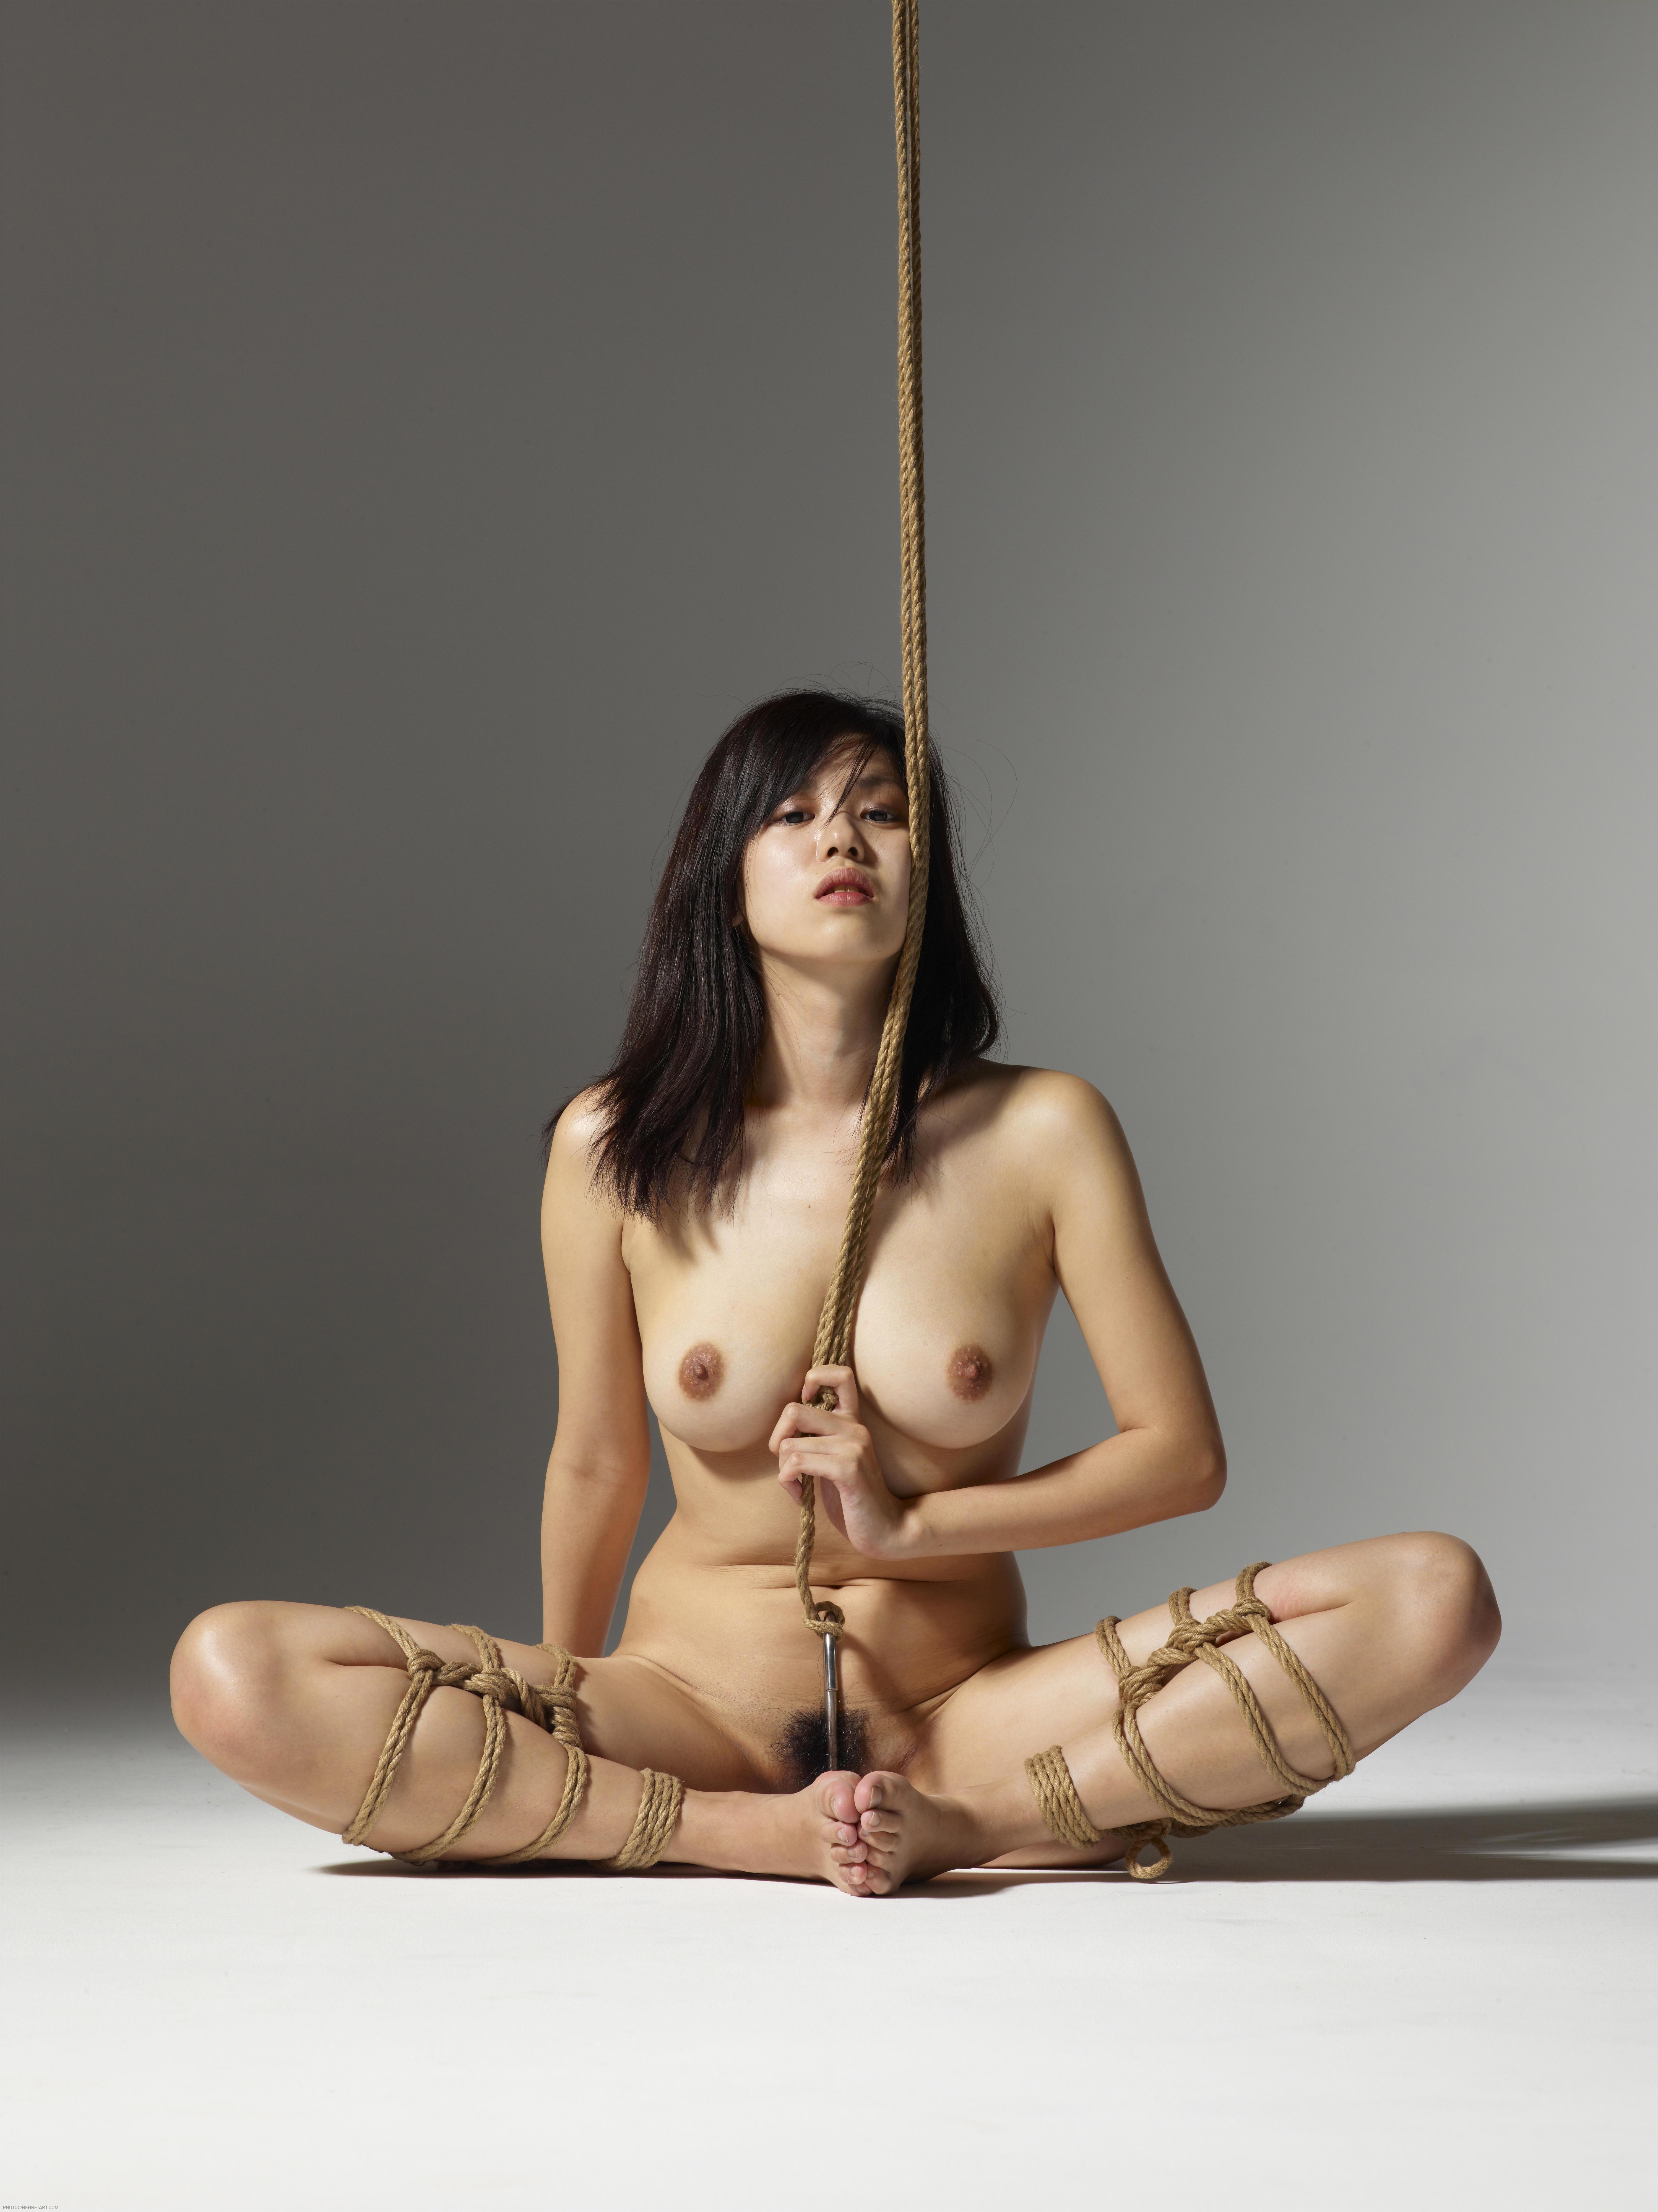 redtube.con femdom slave